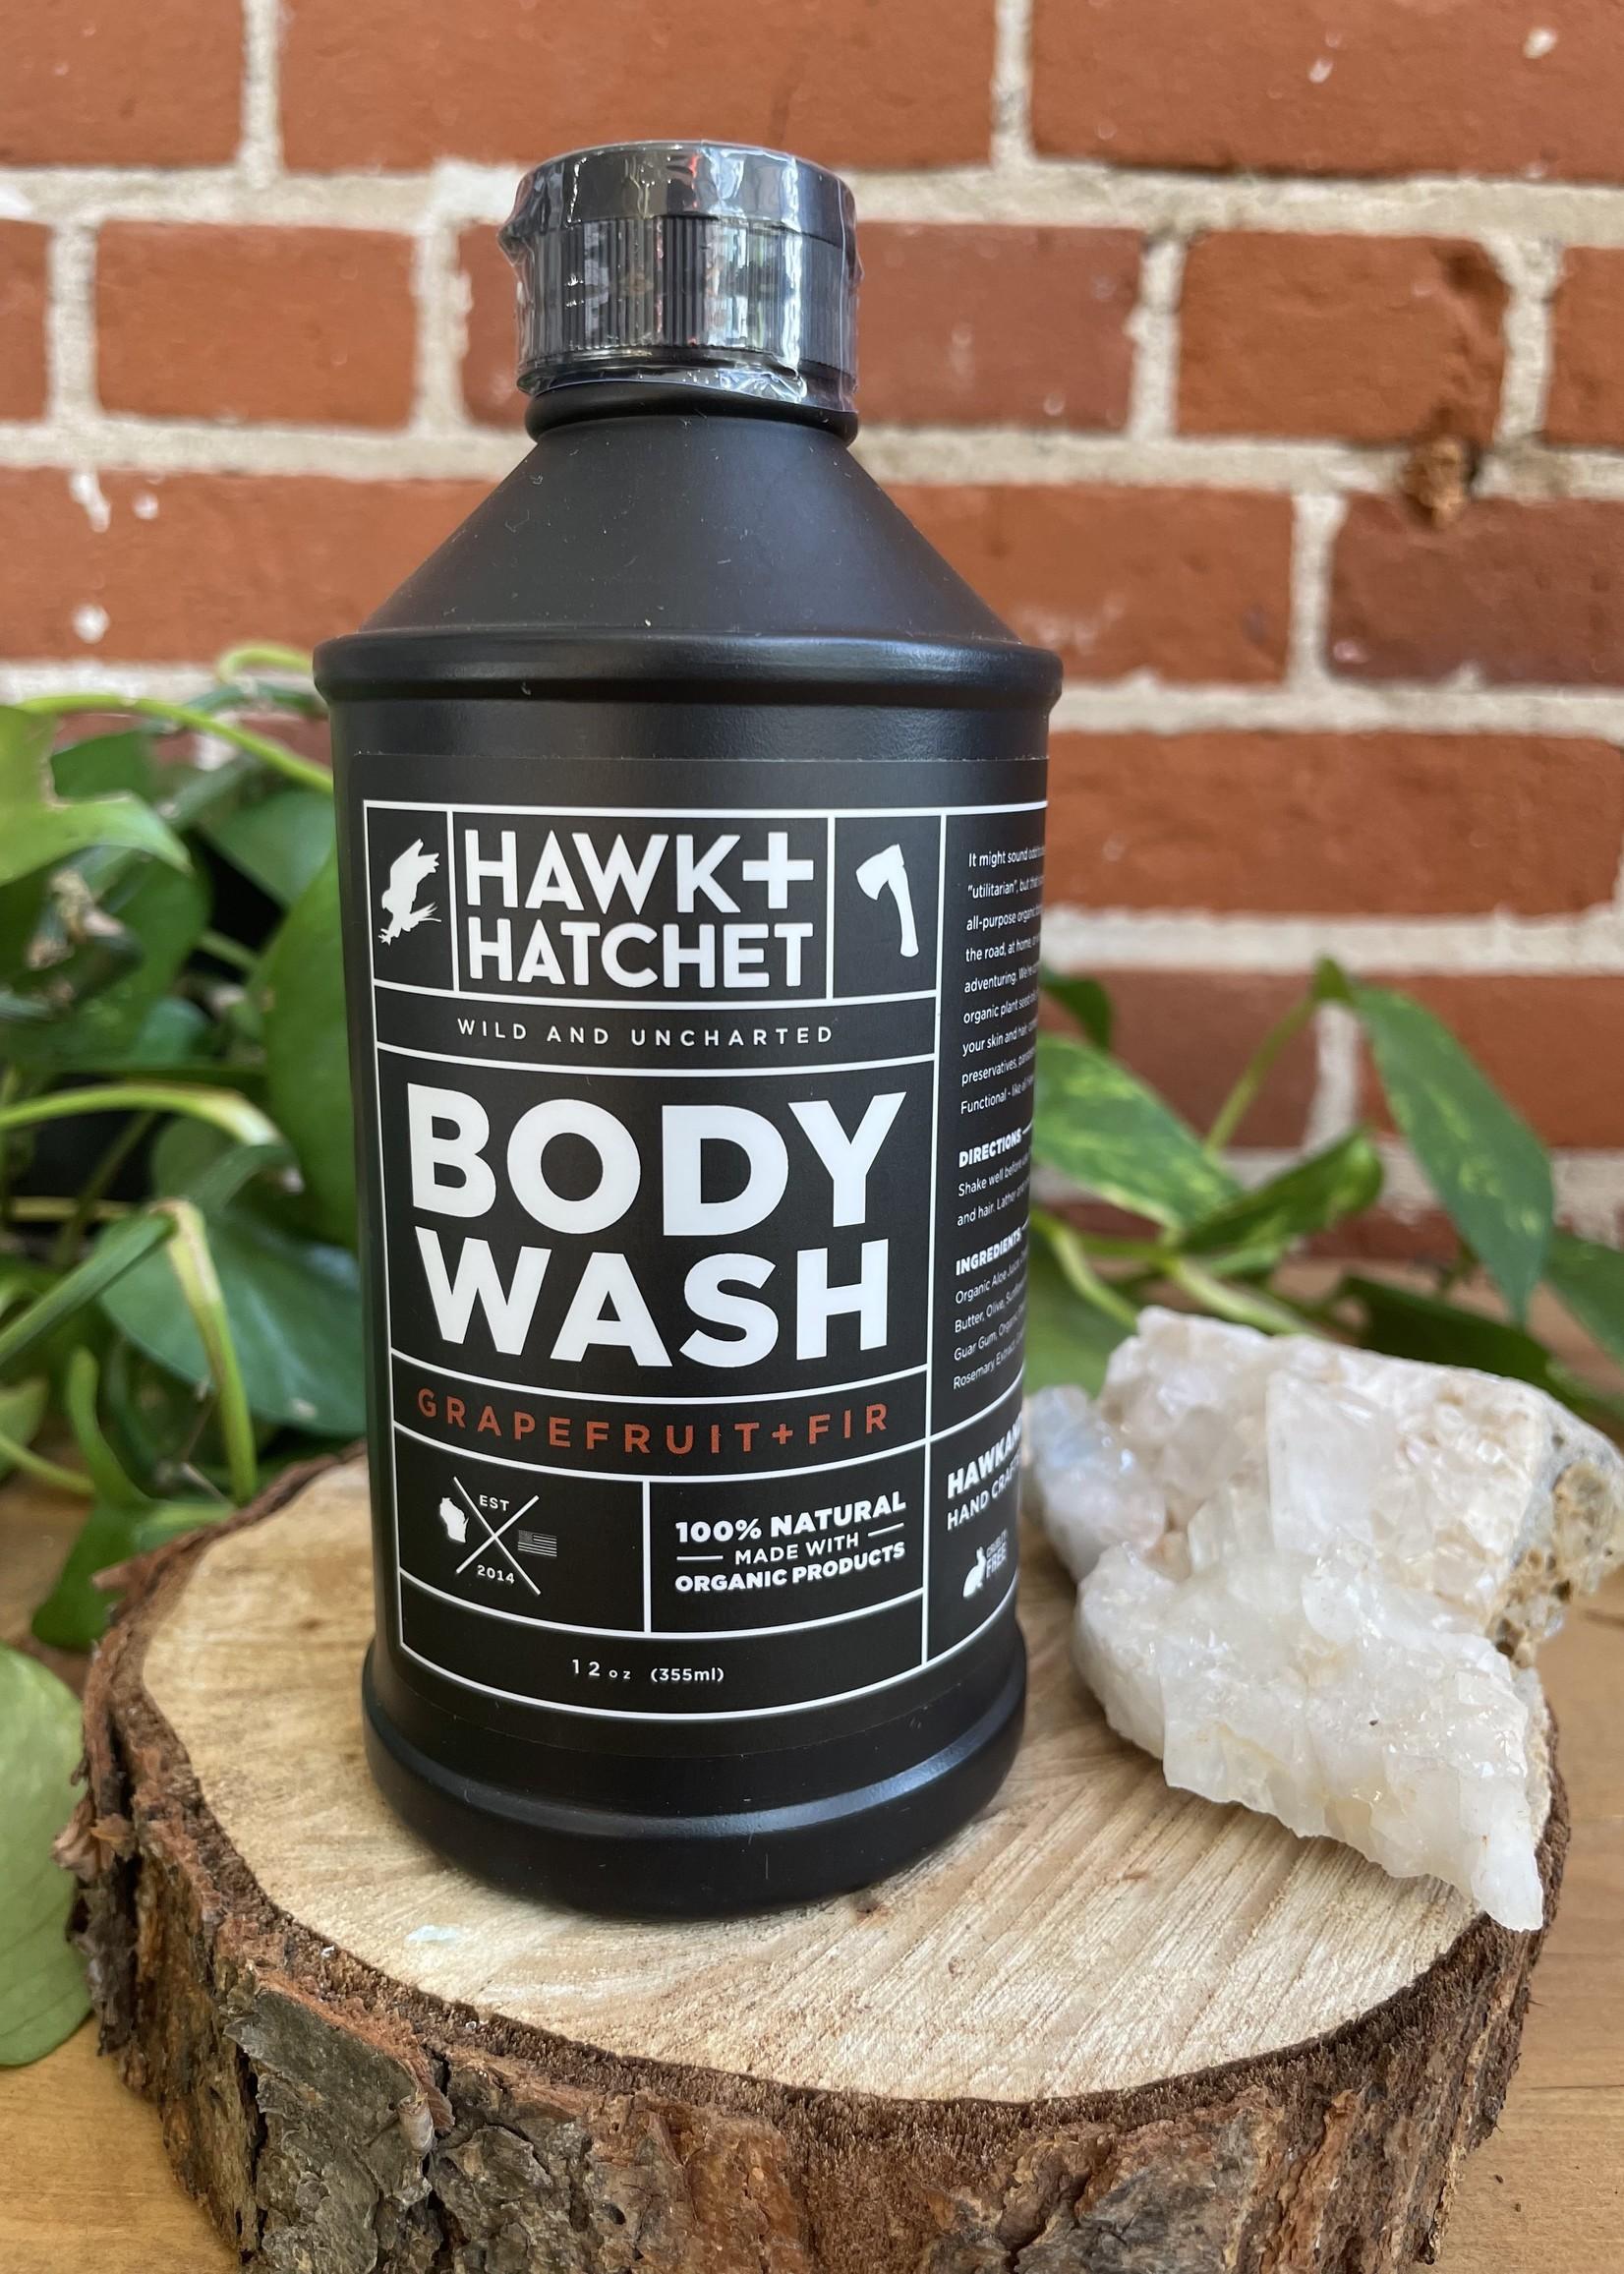 Hawk + Hatchet Hawk + Hatchet: Body Wash